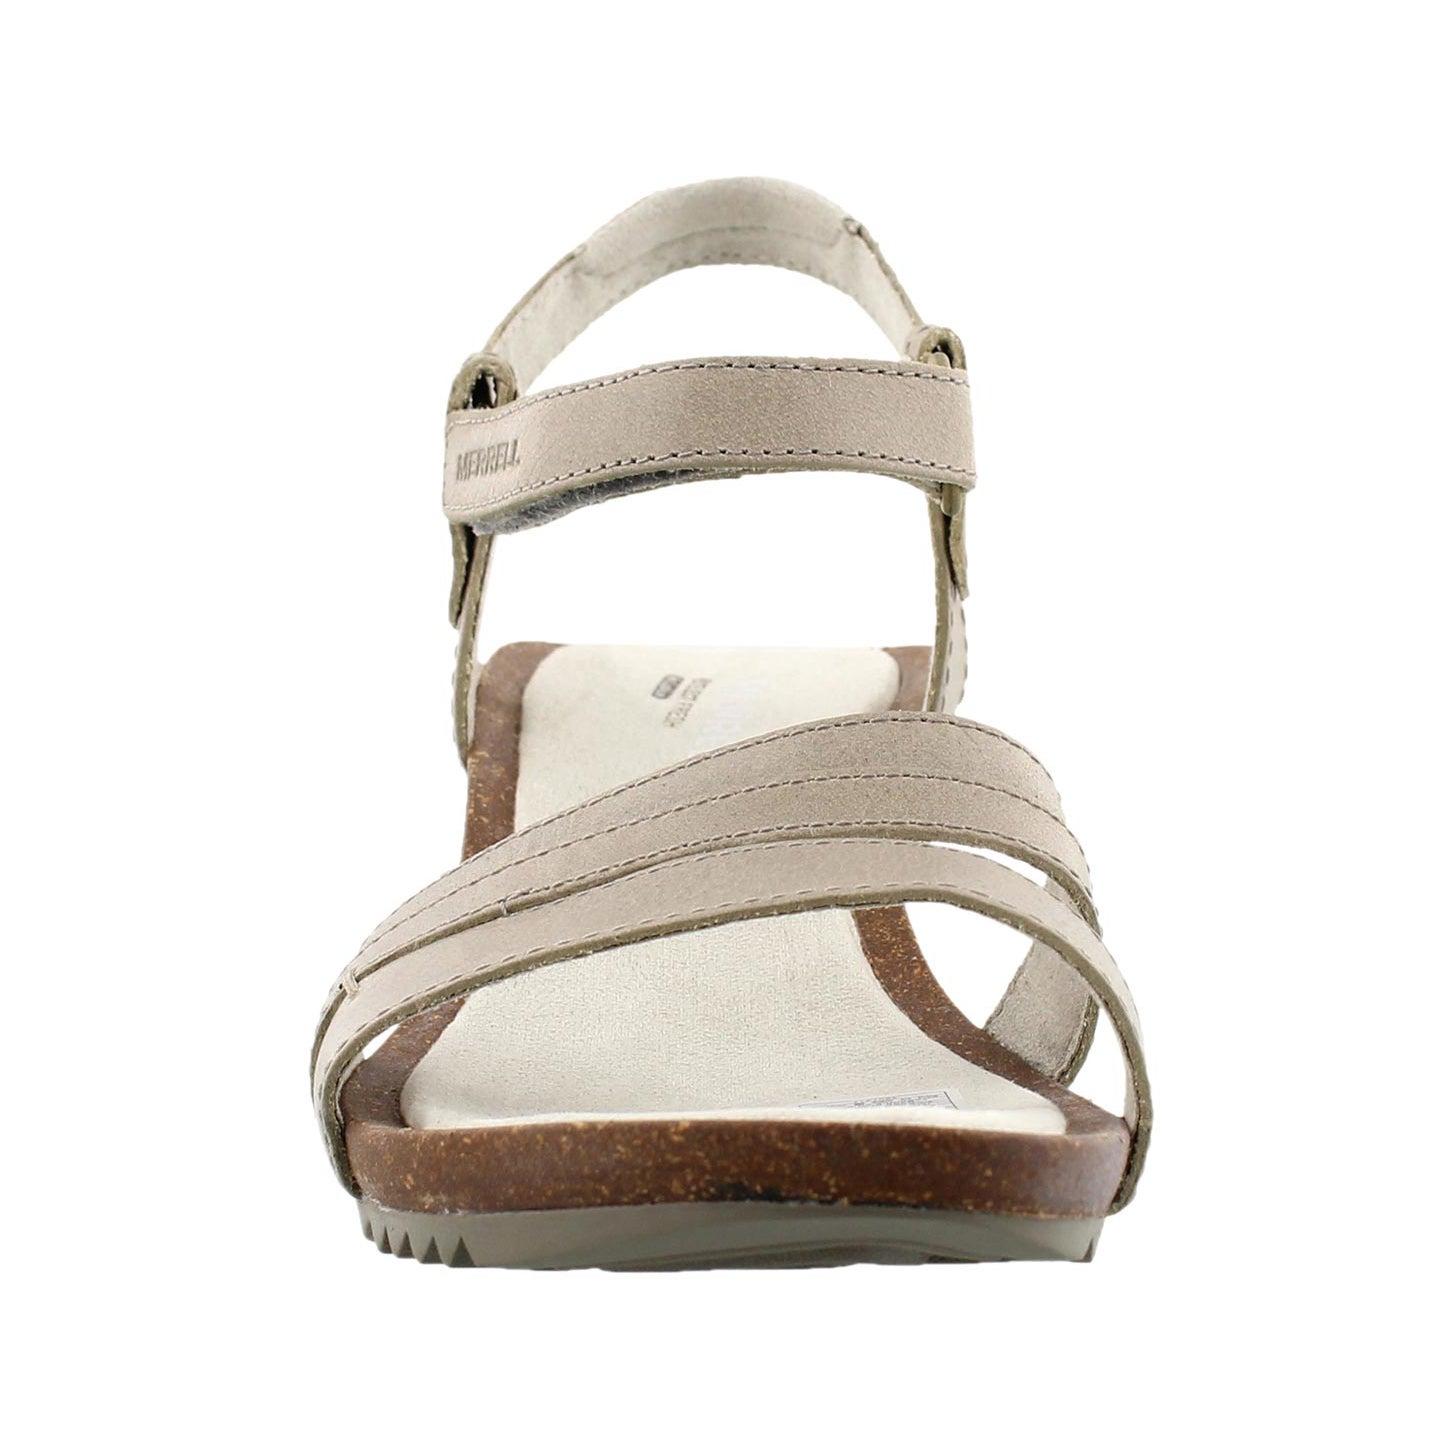 Lds Revalli Aura Strap gry wedge sandal